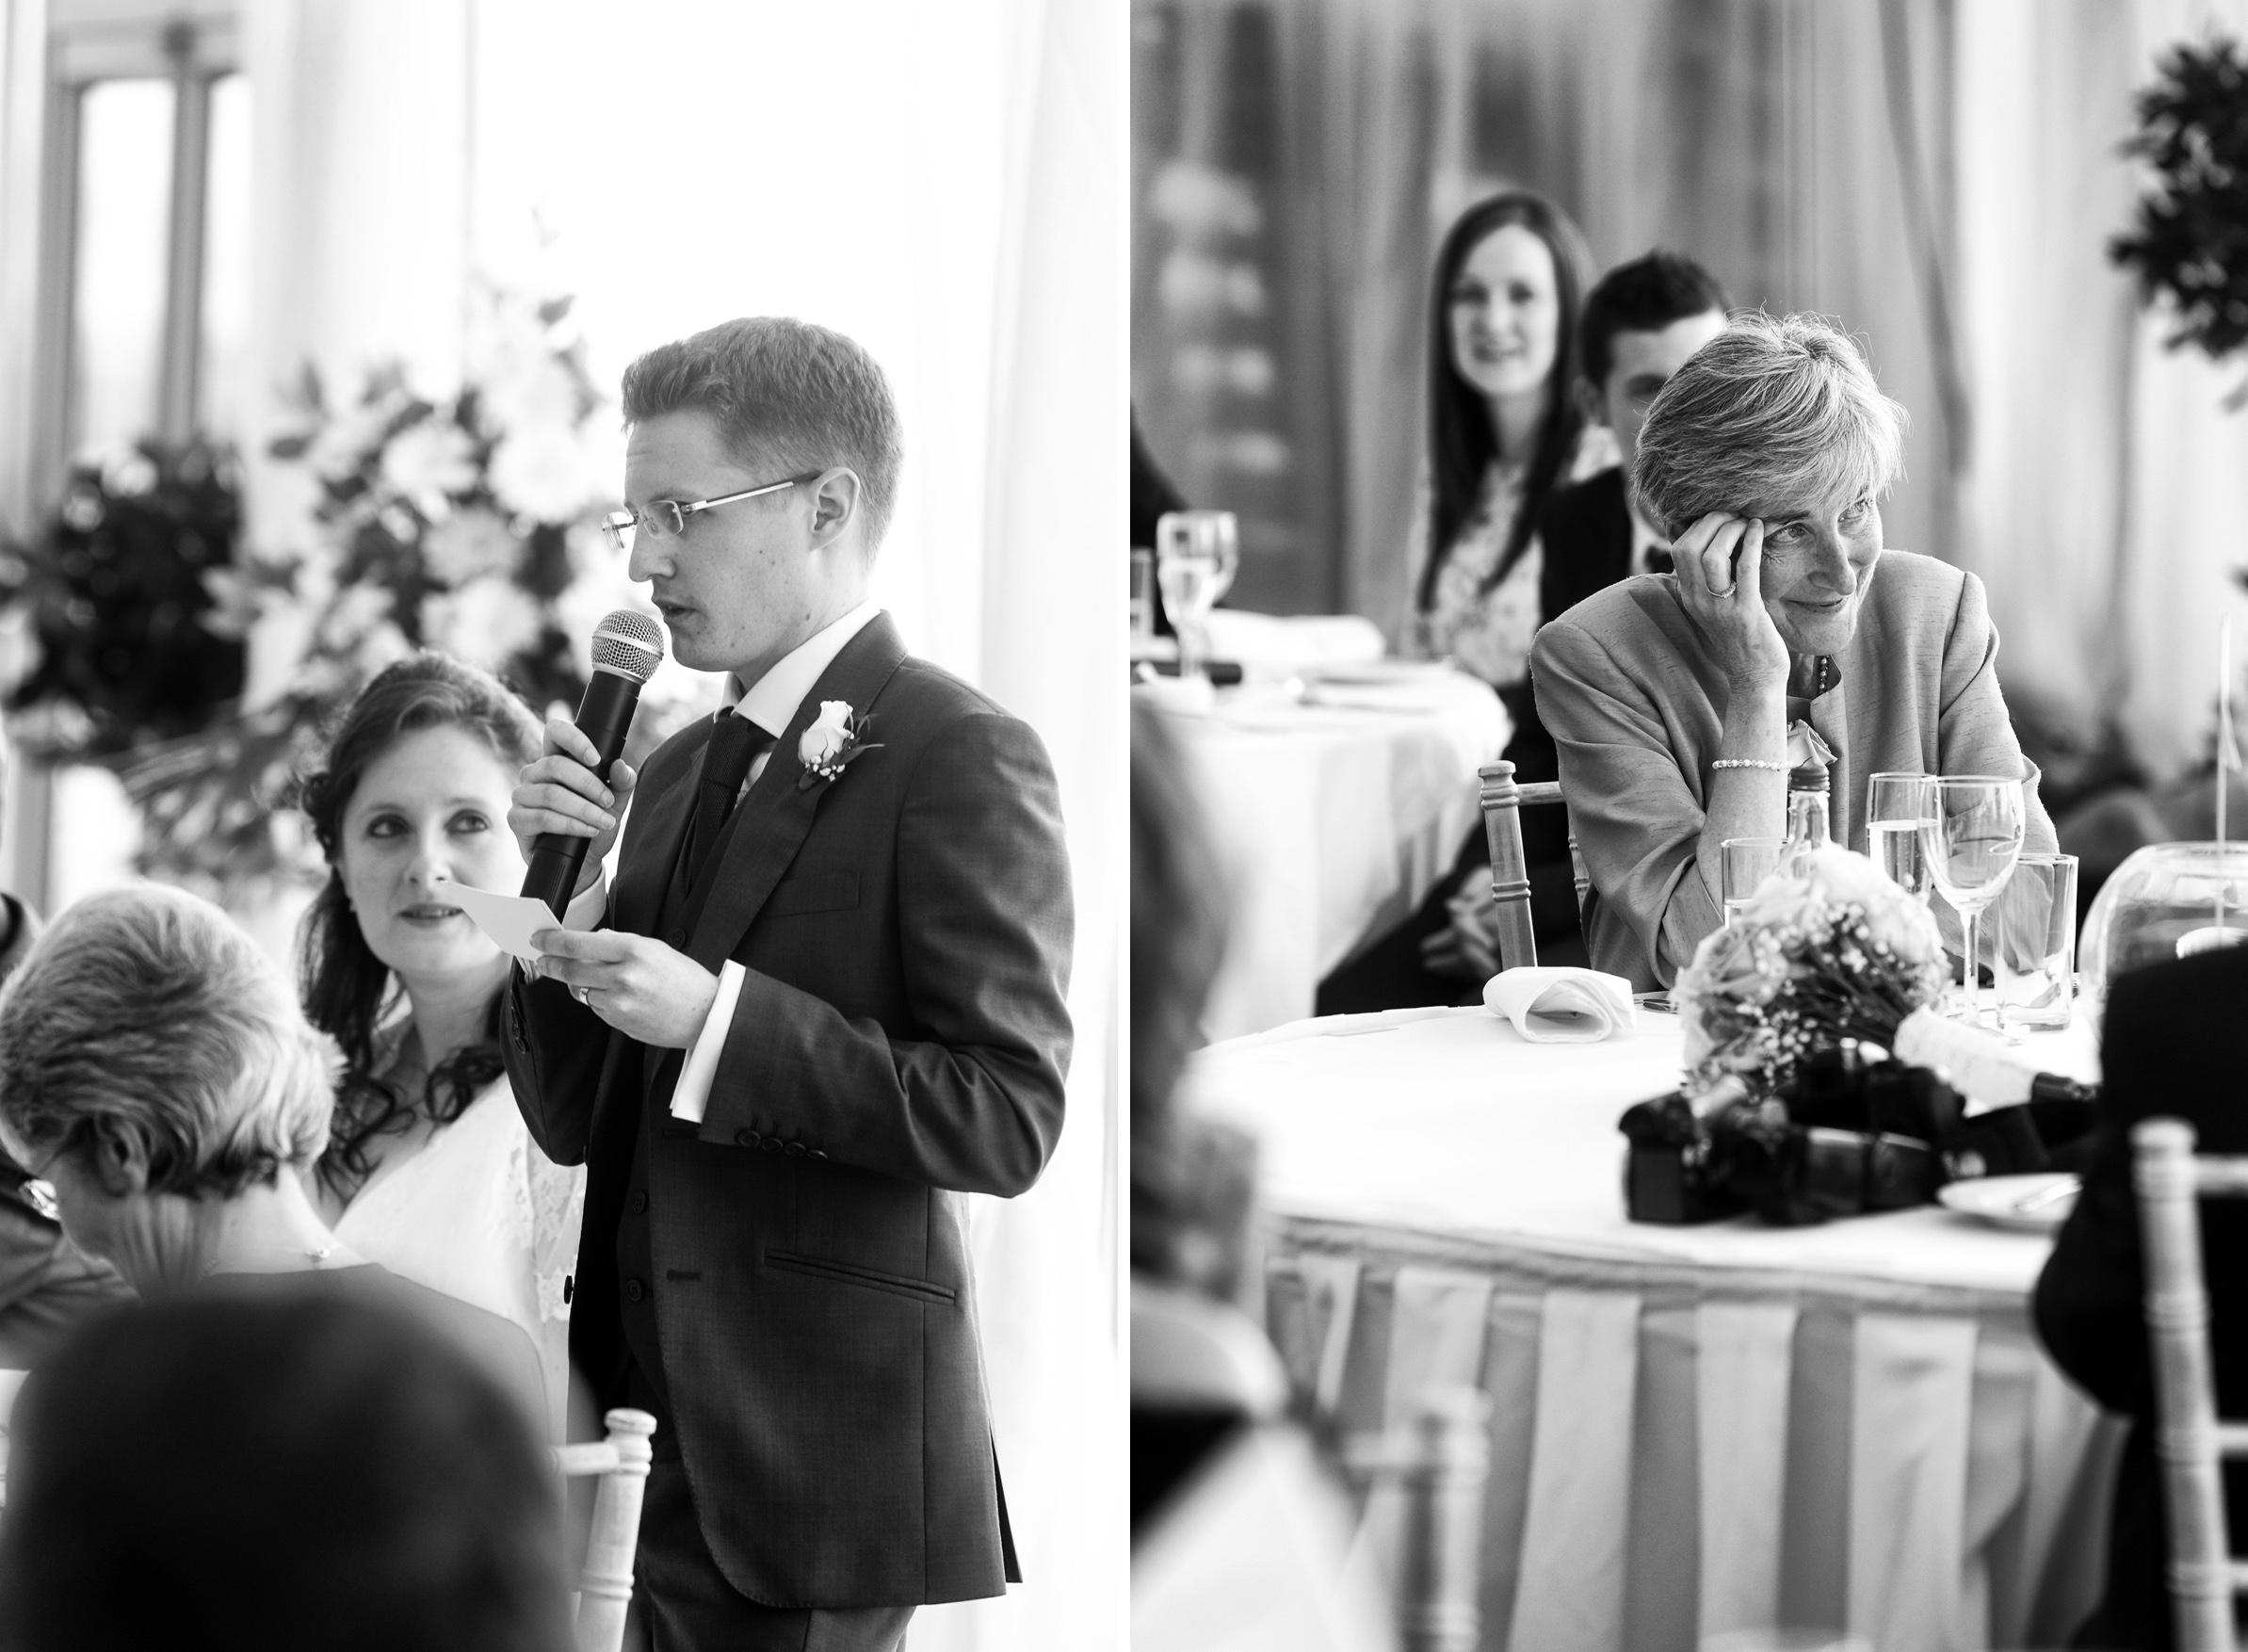 Ocean-View-Gower-Wedding-Photographer-063.JPG